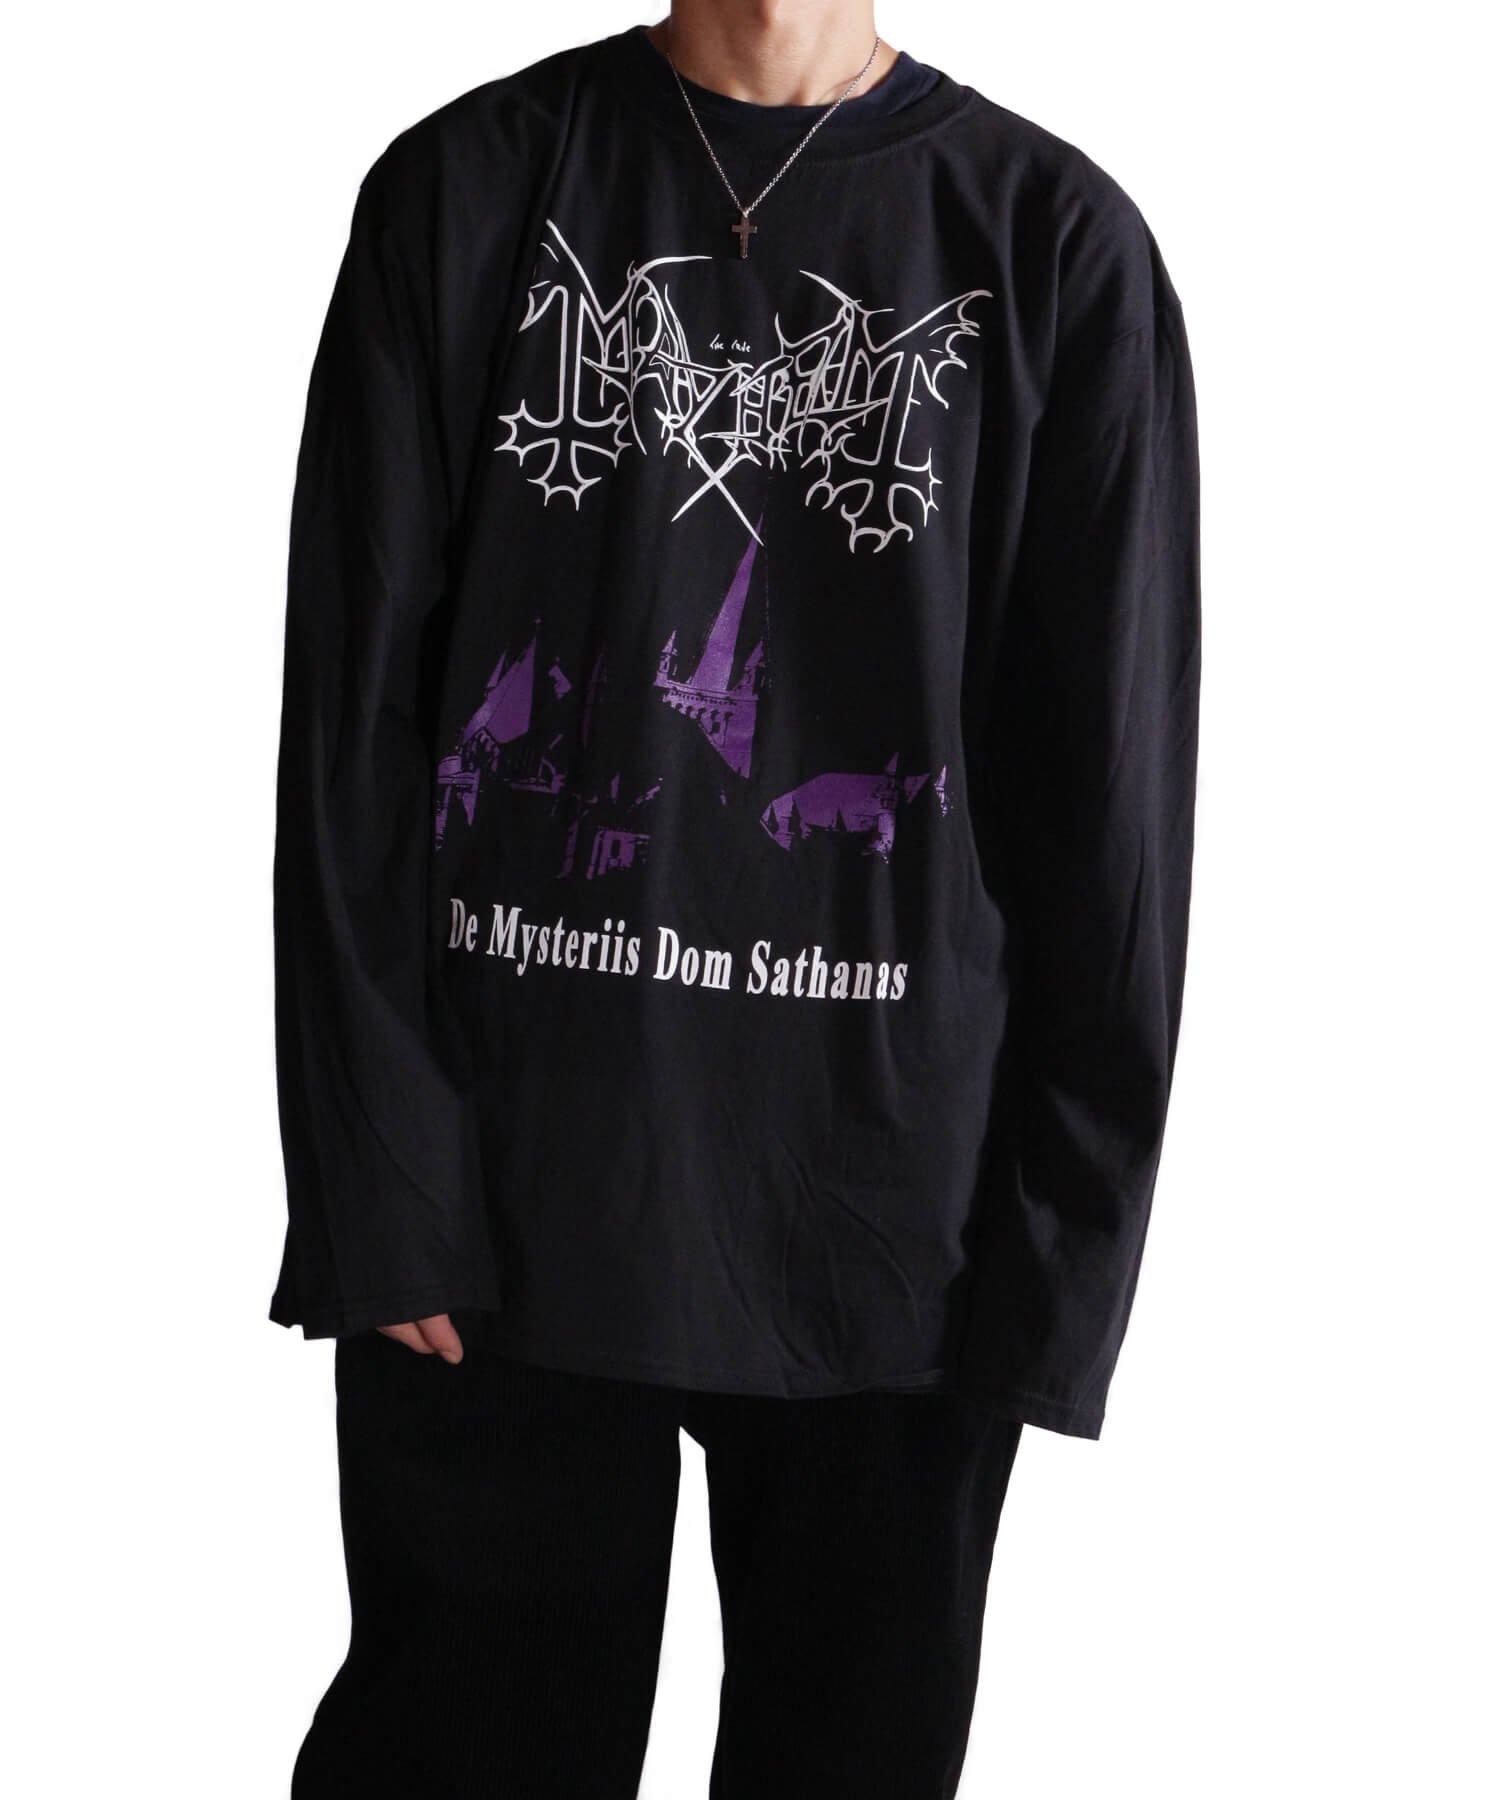 Official Artist Goods / バンドTなど |MAYHEM / メイヘム:DE MYSTERIIS DOM SATHANAS LONG SLEEVE SHIRT (BLACK) 商品画像13